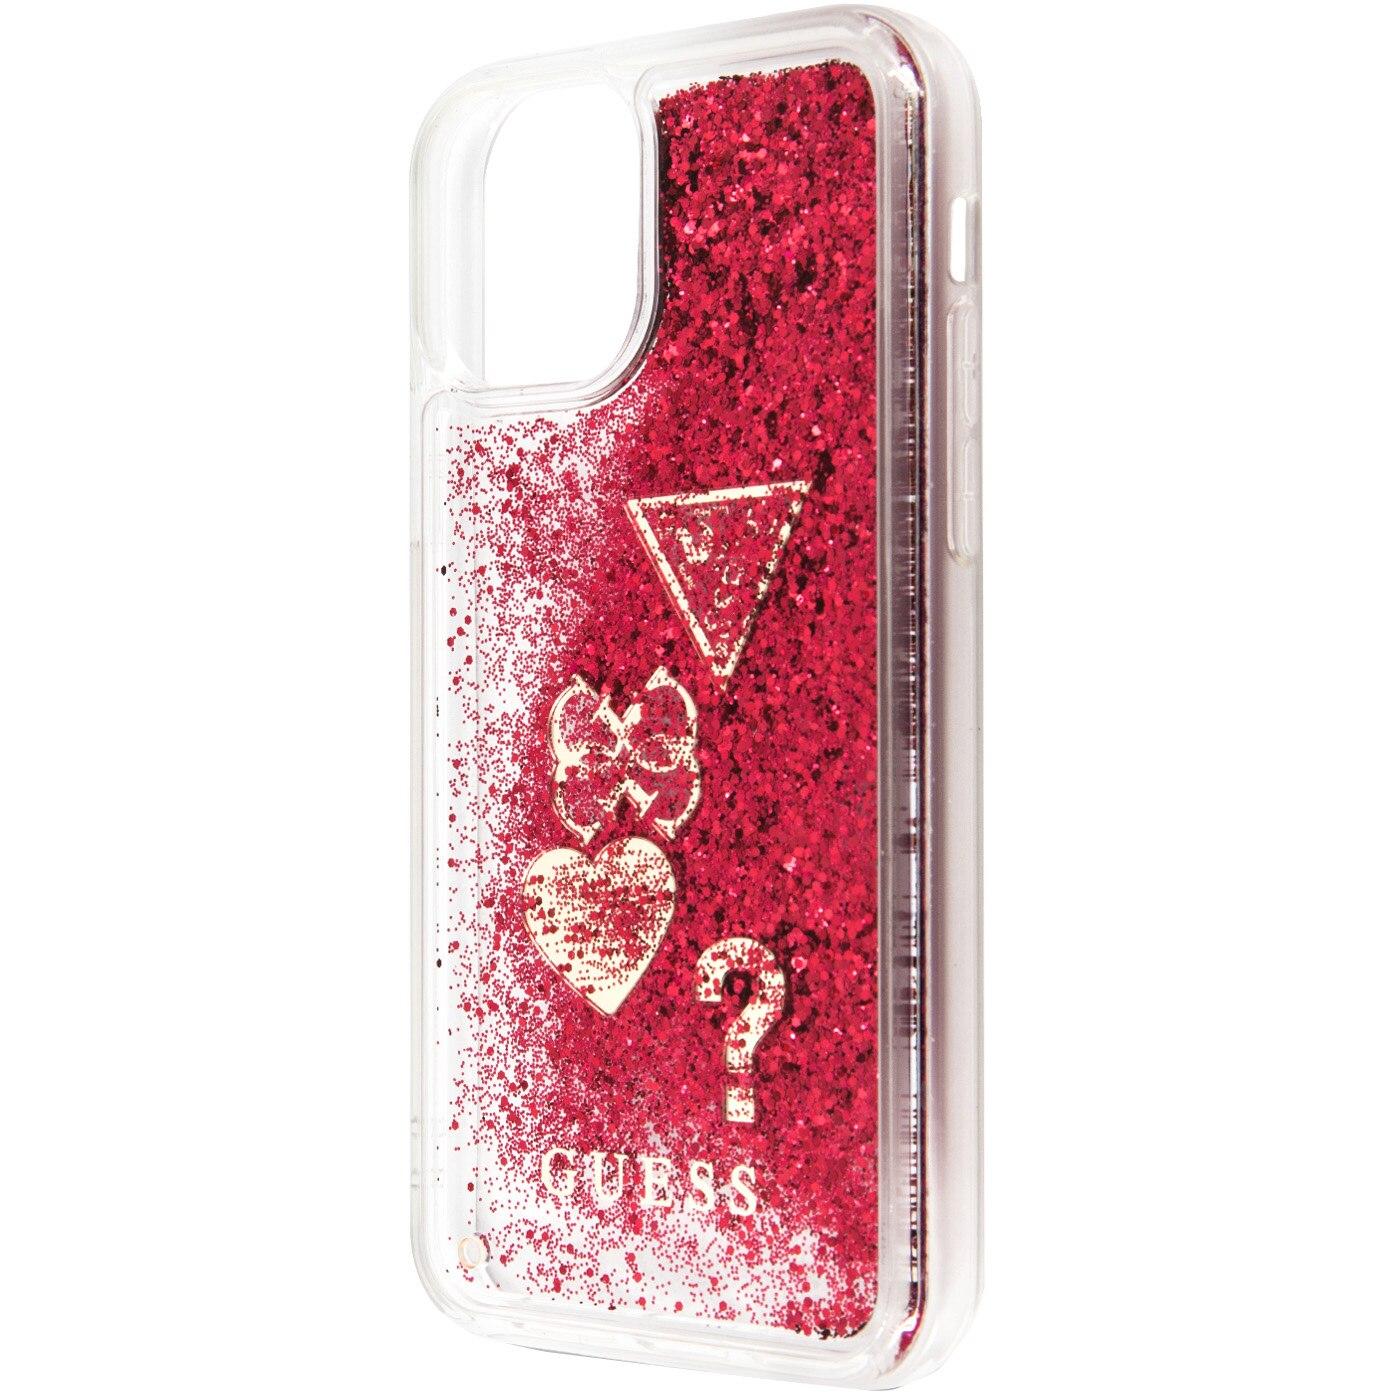 Fotografie Husa de protectie Guess Glitter Hearts pentru iPhone 11 Pro Max, Raspberry